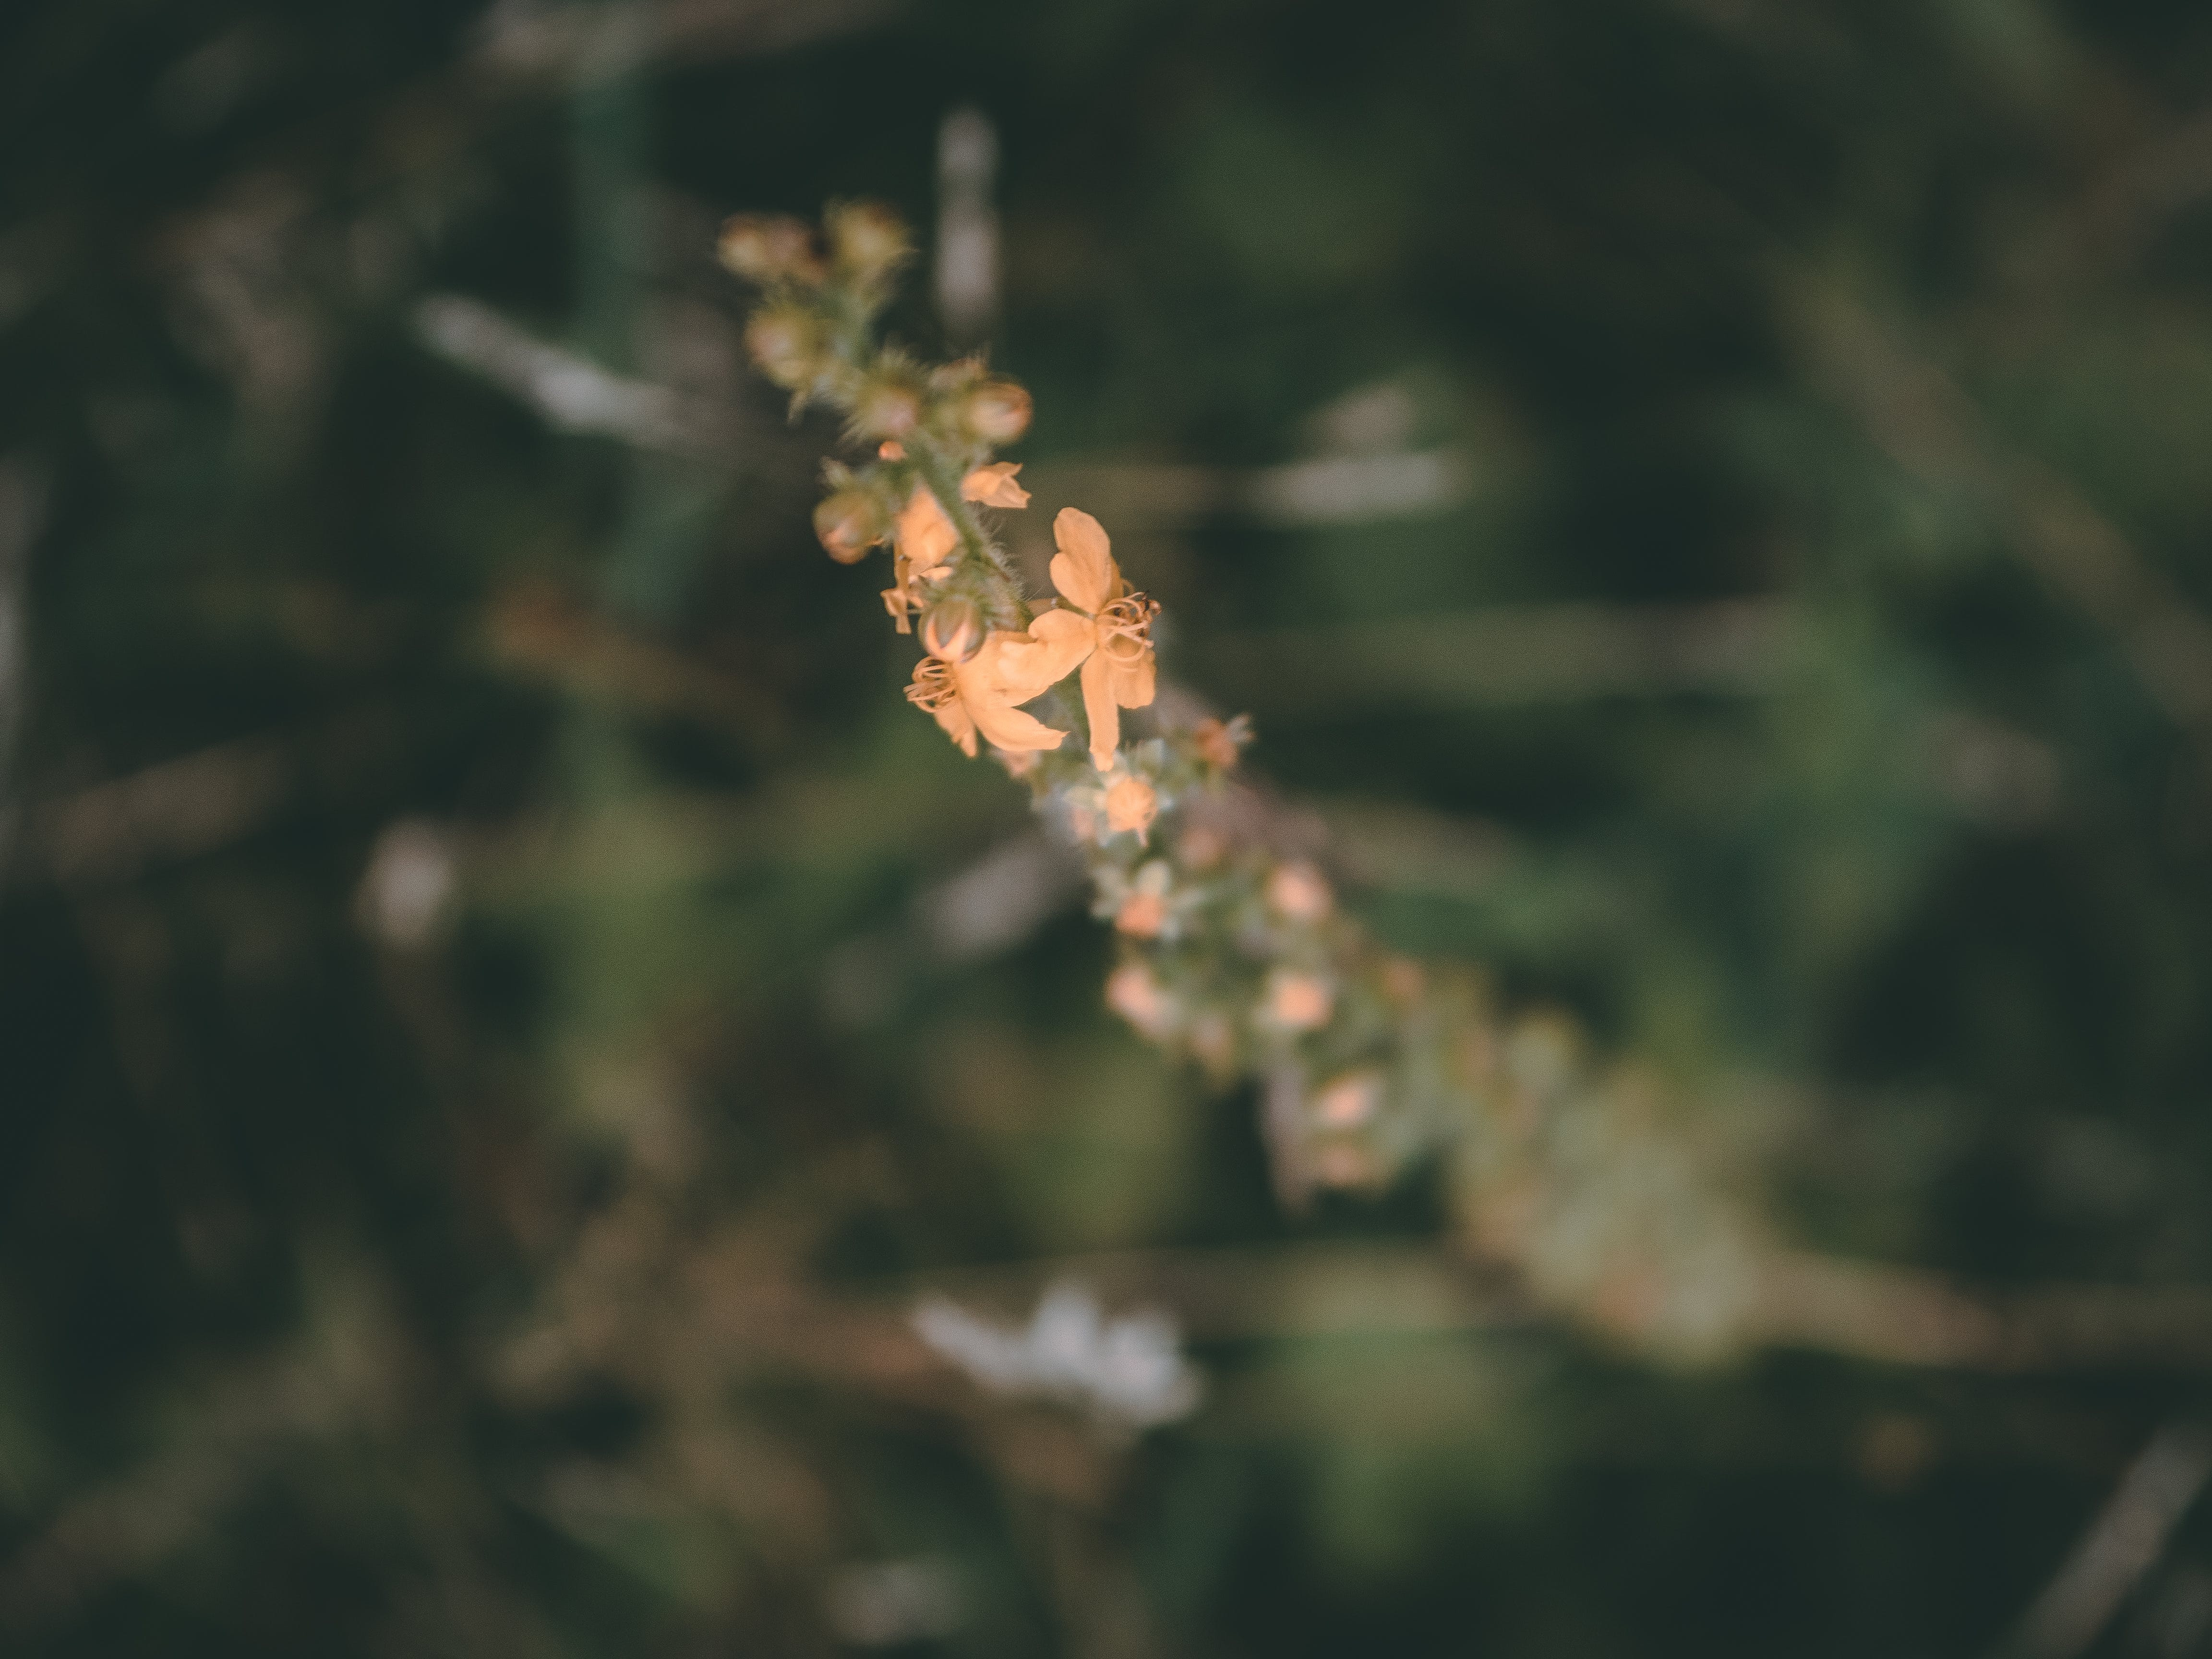 Free stock photo of bloom, blossom, blur, depth